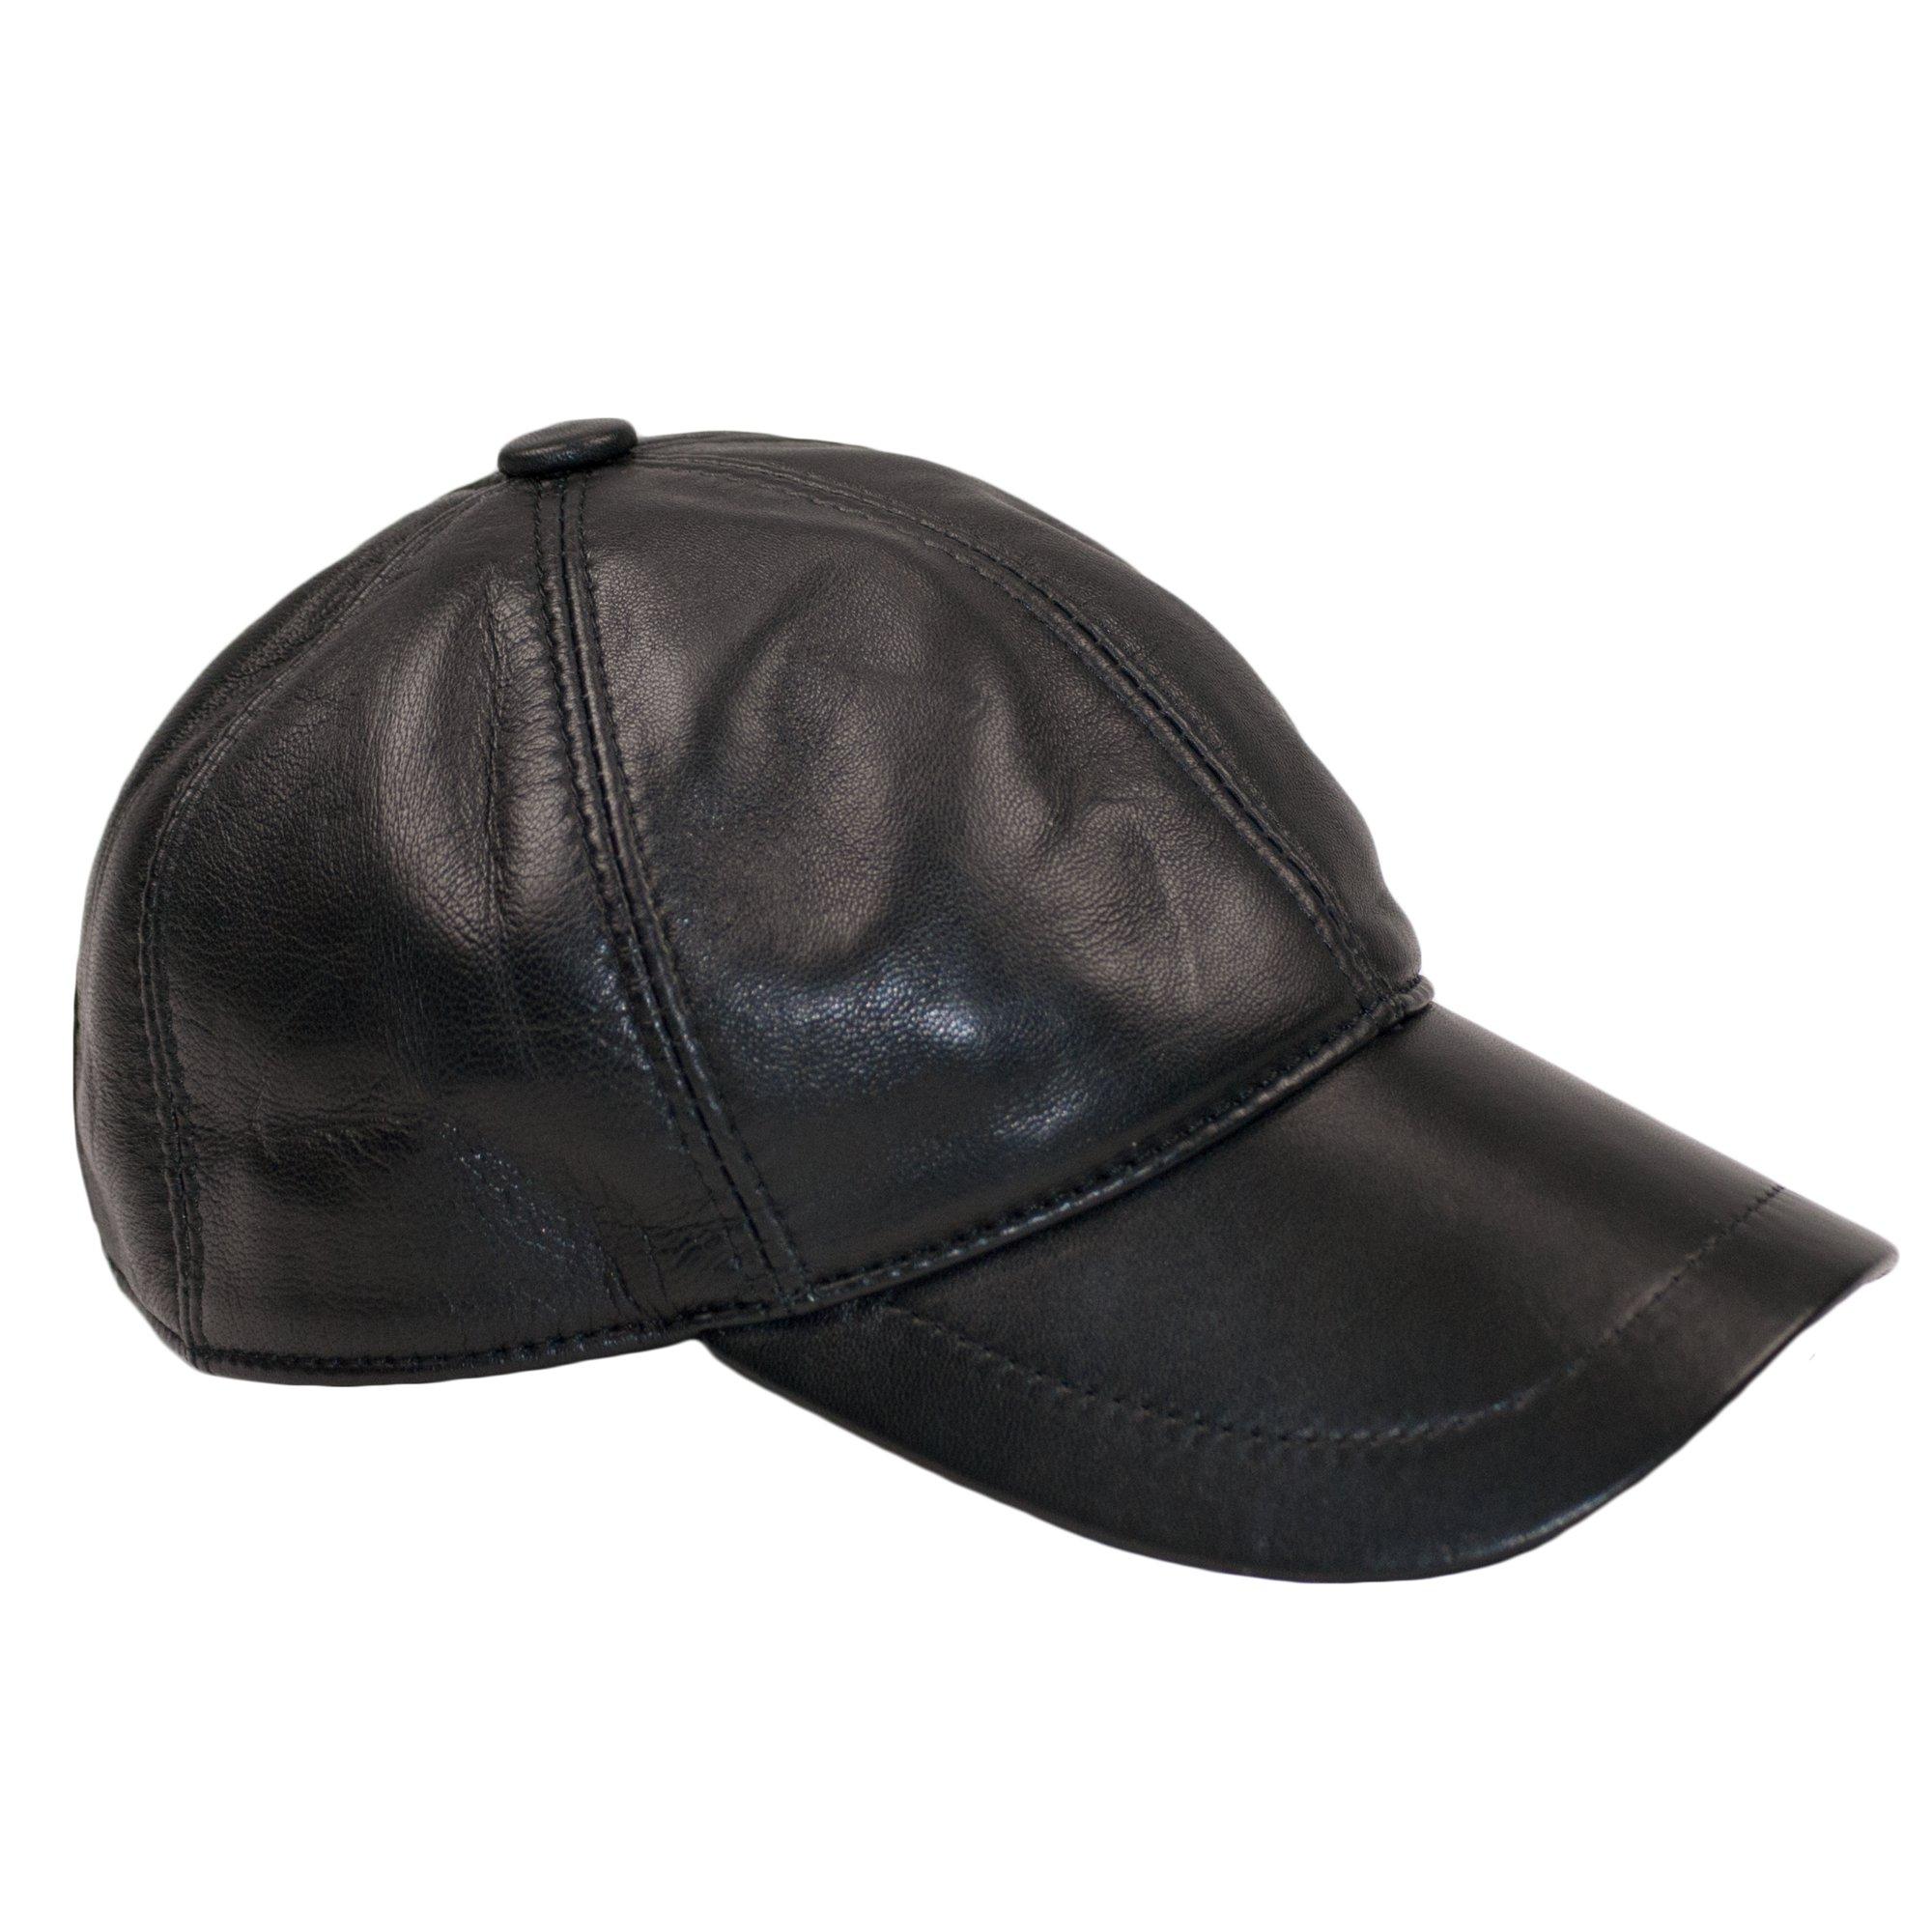 Dazoriginal Berretto da Baseball Cap Pelle Cappellino Uomo Visiera Cappello  Nero product image 4611901cd21b